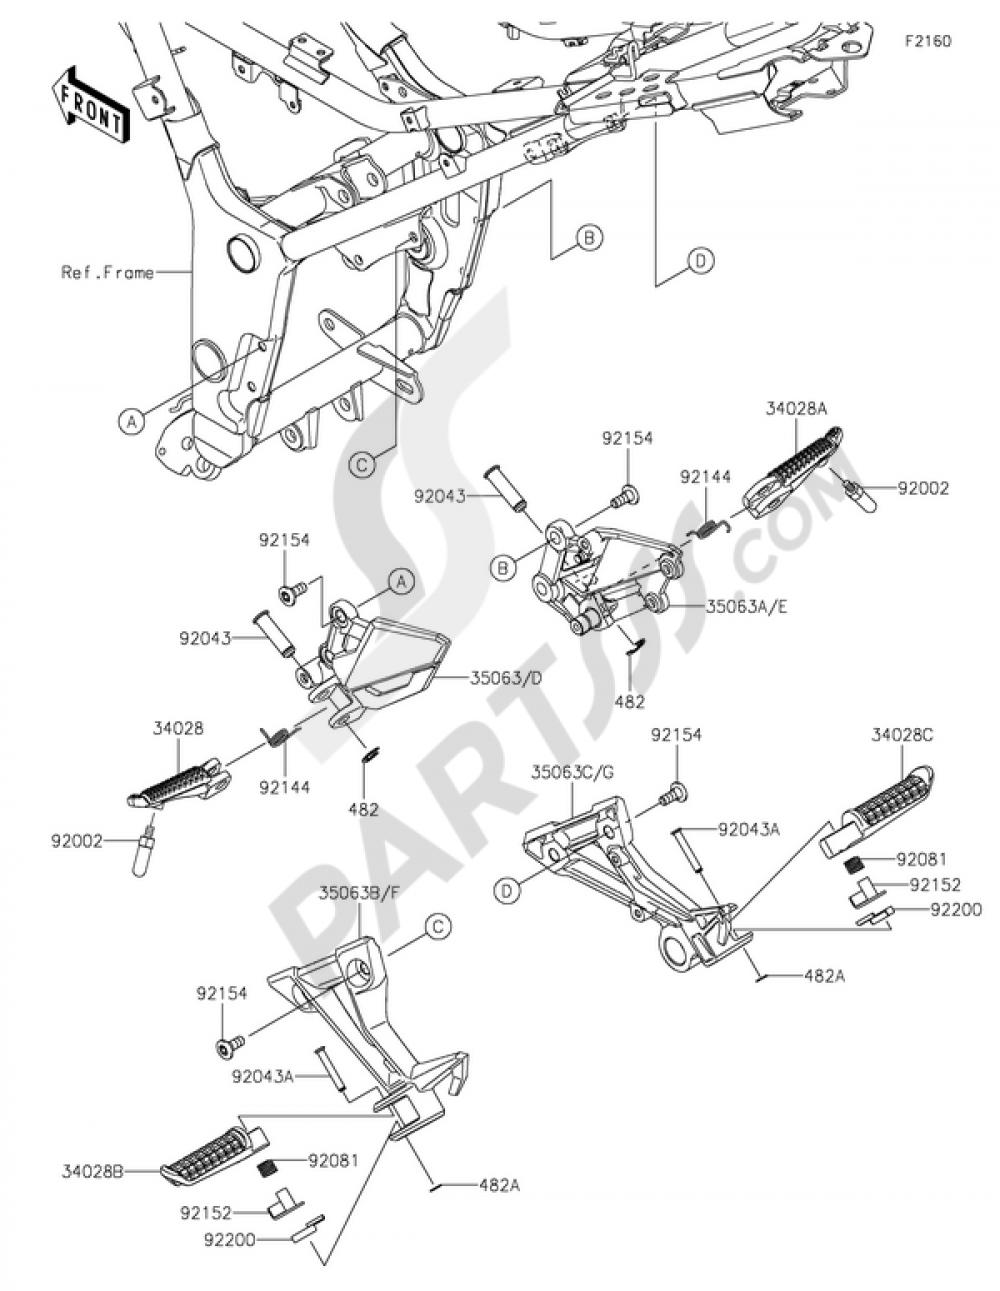 Footrests Kawasaki Ninja 300 Abs 2014 Engine Diagram